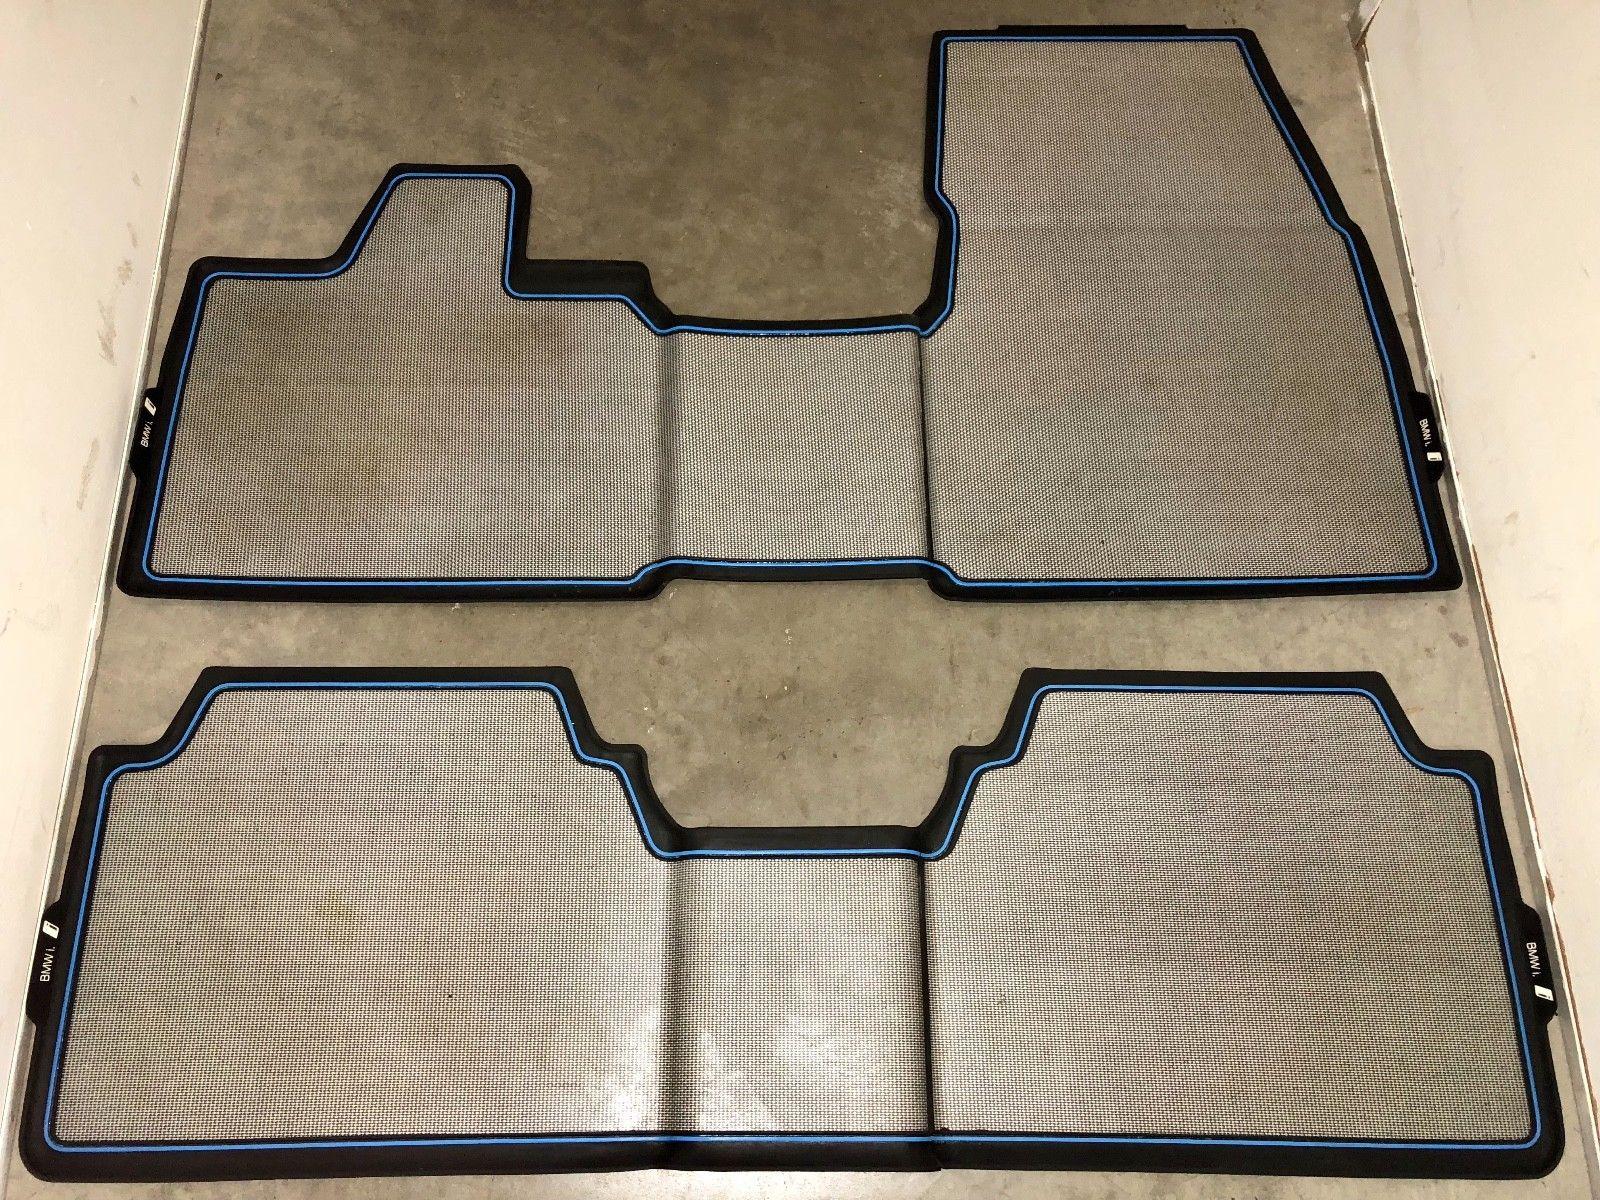 image beige bmw floor loading series sapp mats itm ribb tailored b is